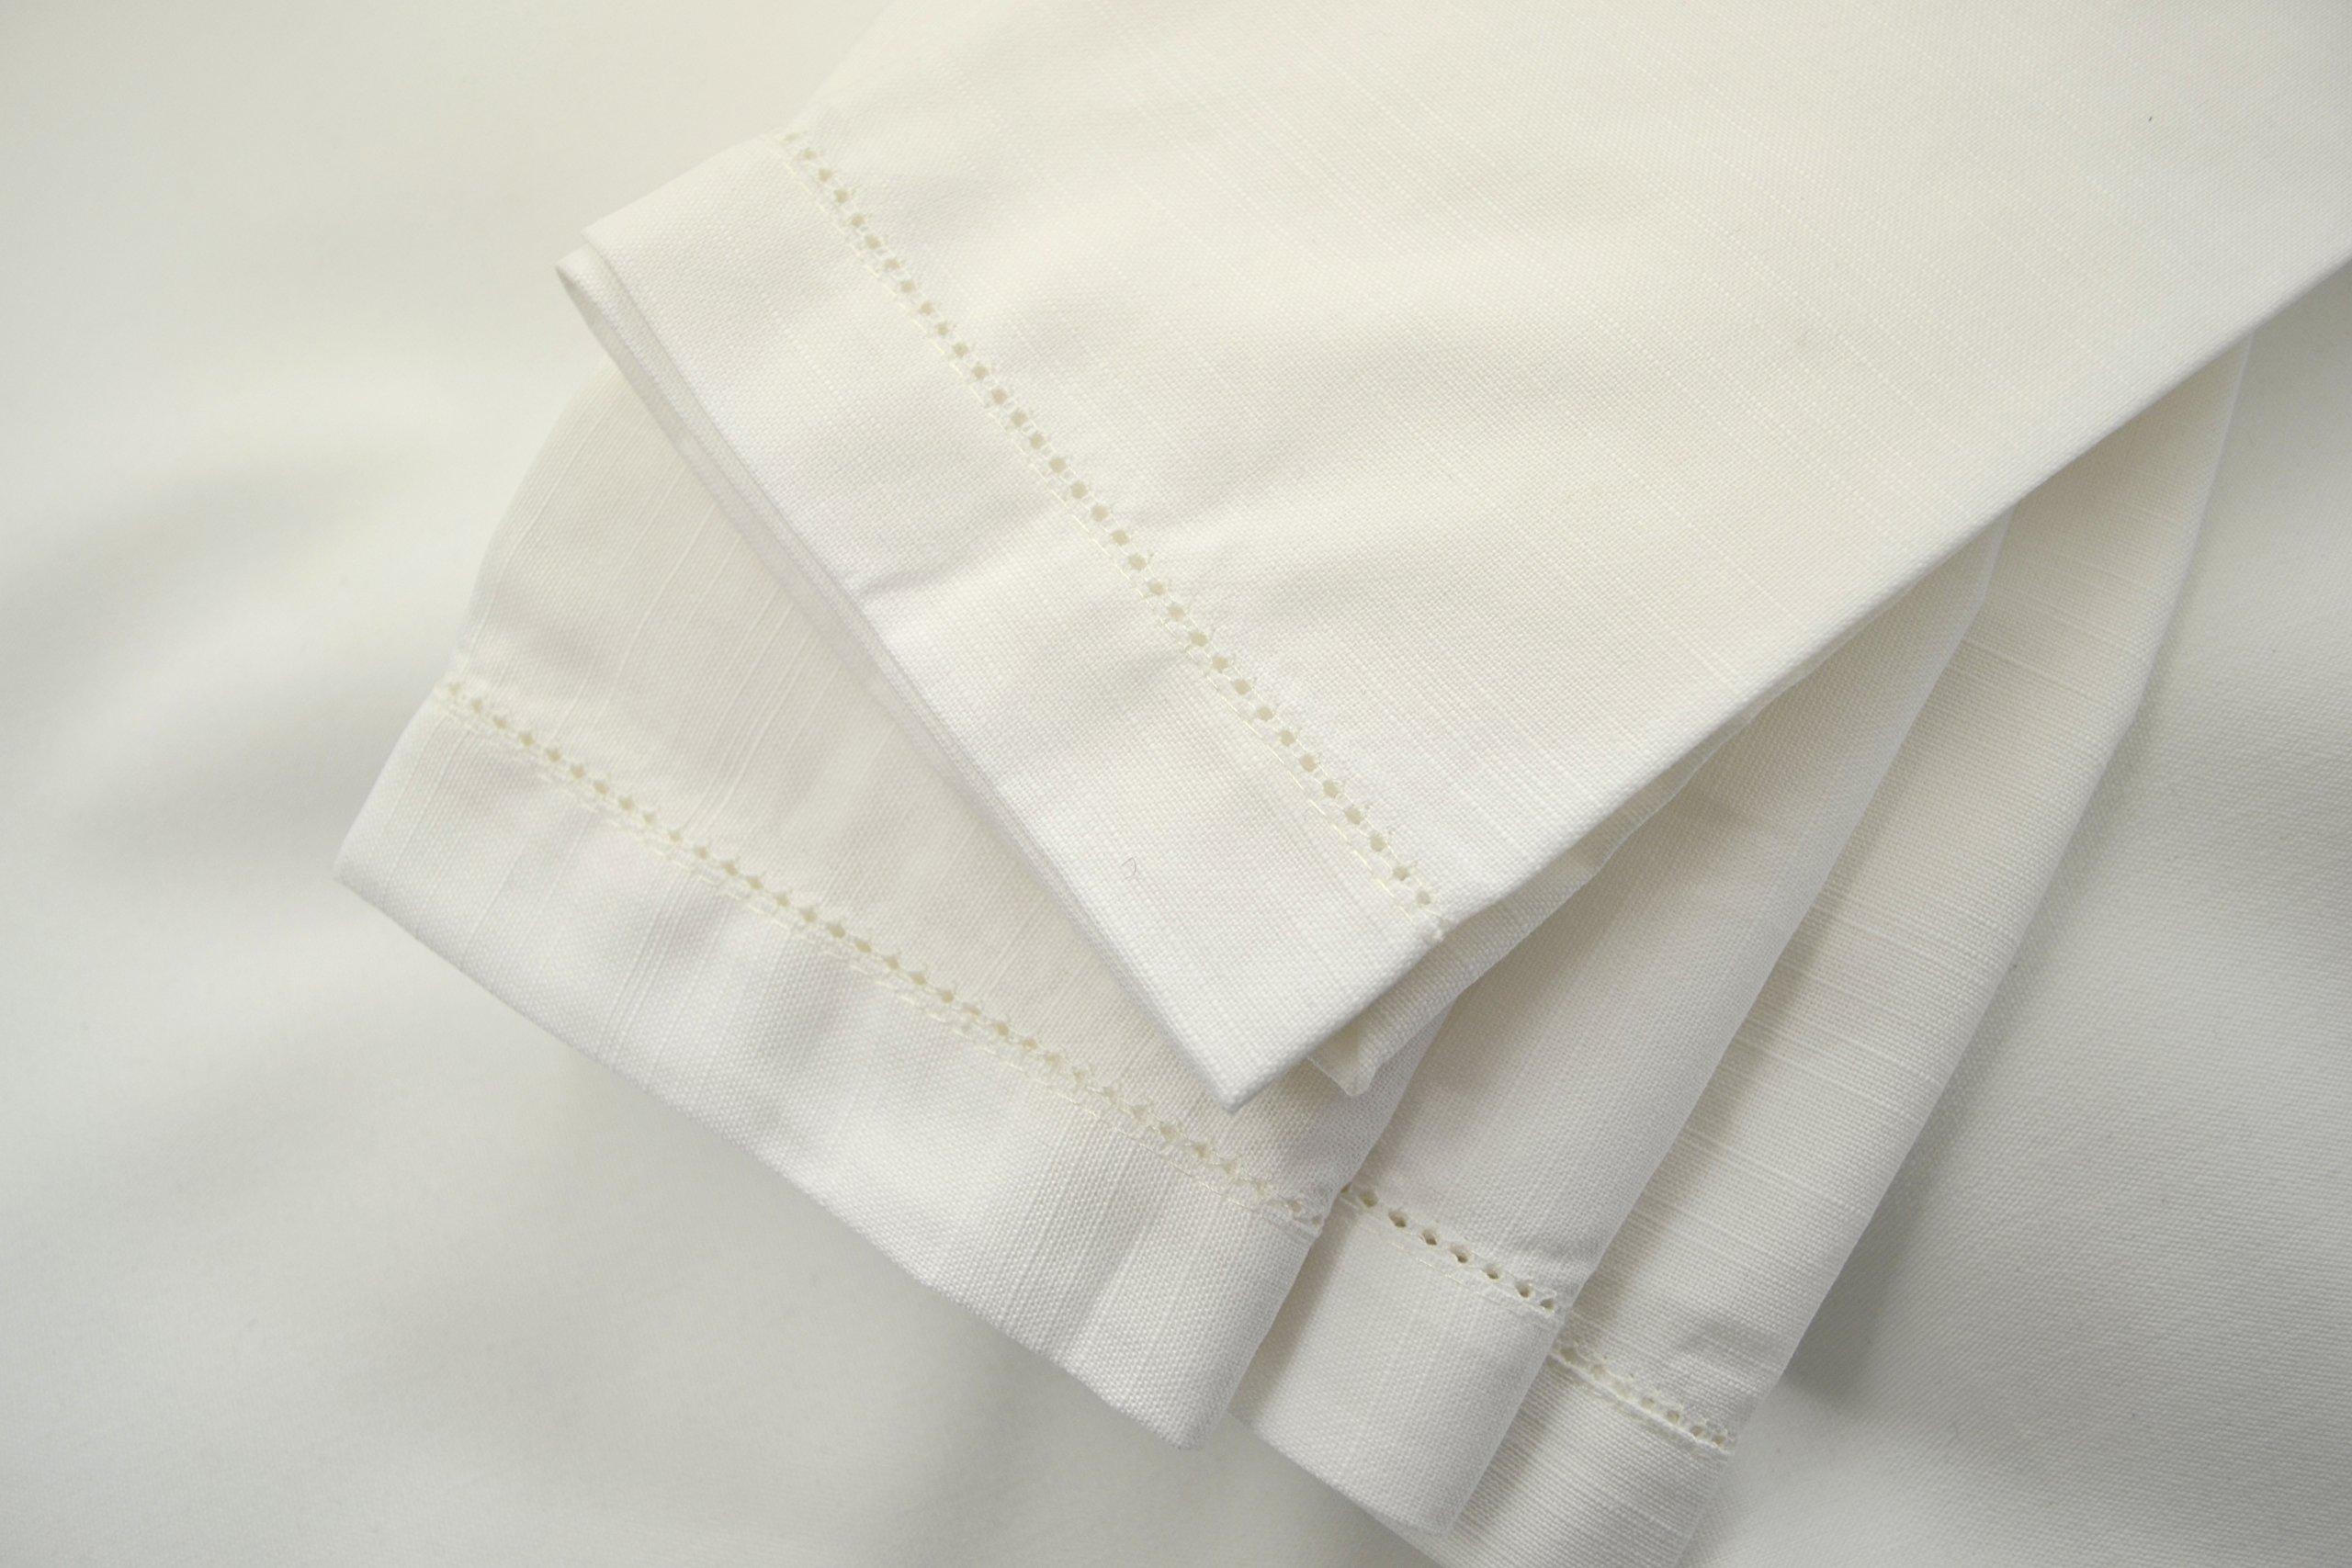 Hemstitch Dinner Napkins White 1 Dozen by Something Different Linen by Something Different Linen (Image #8)